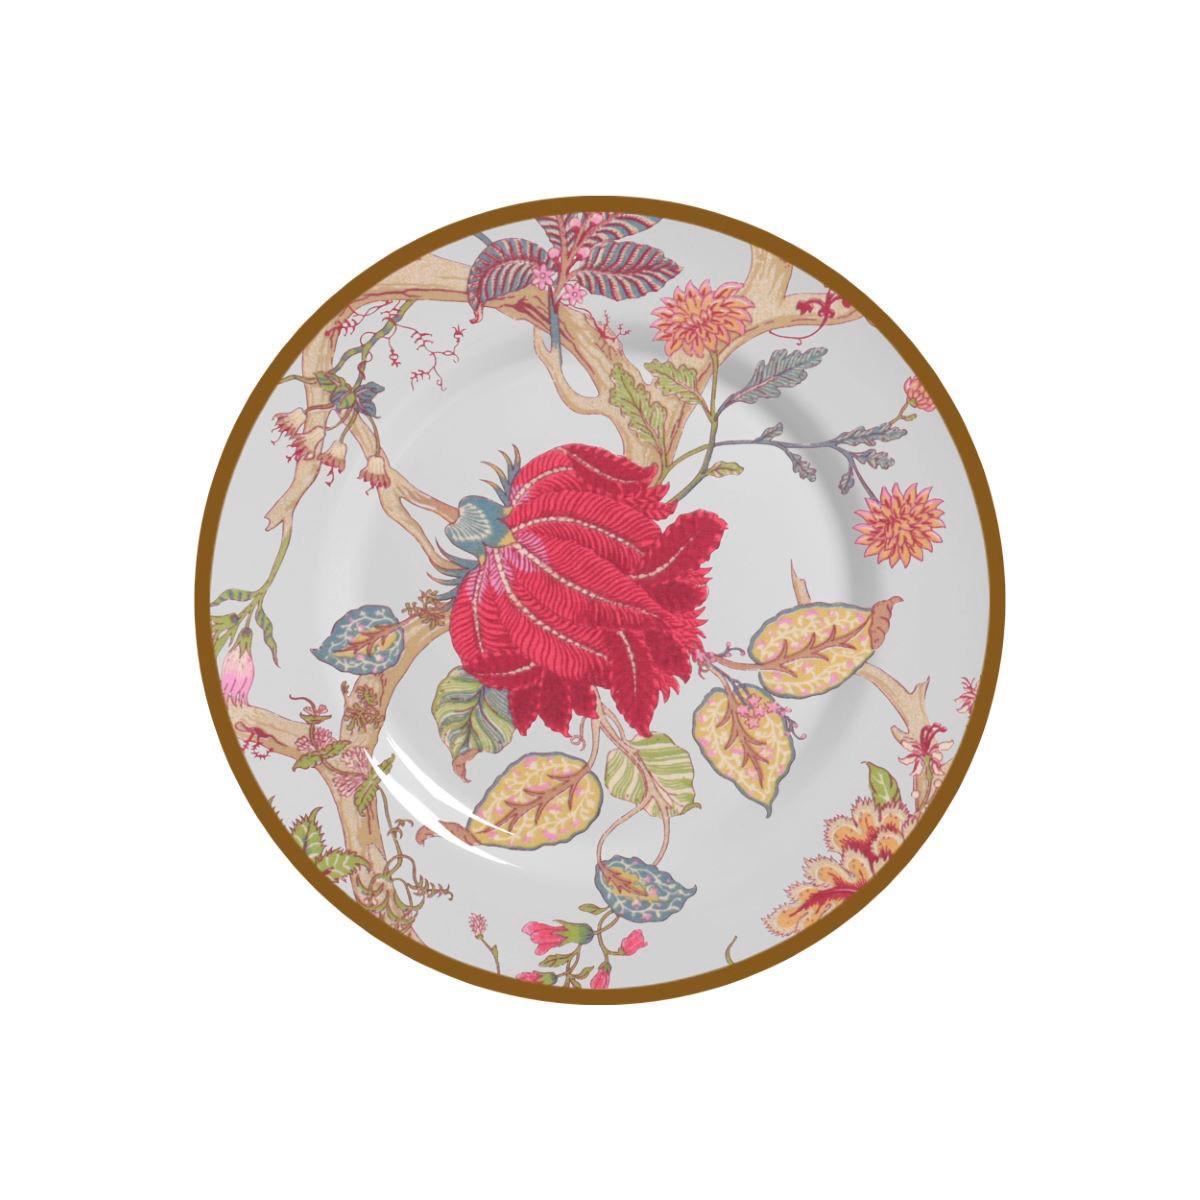 Prato Sobremesa China Flowers Branca Cerâmica Alleanza - 6 Peças